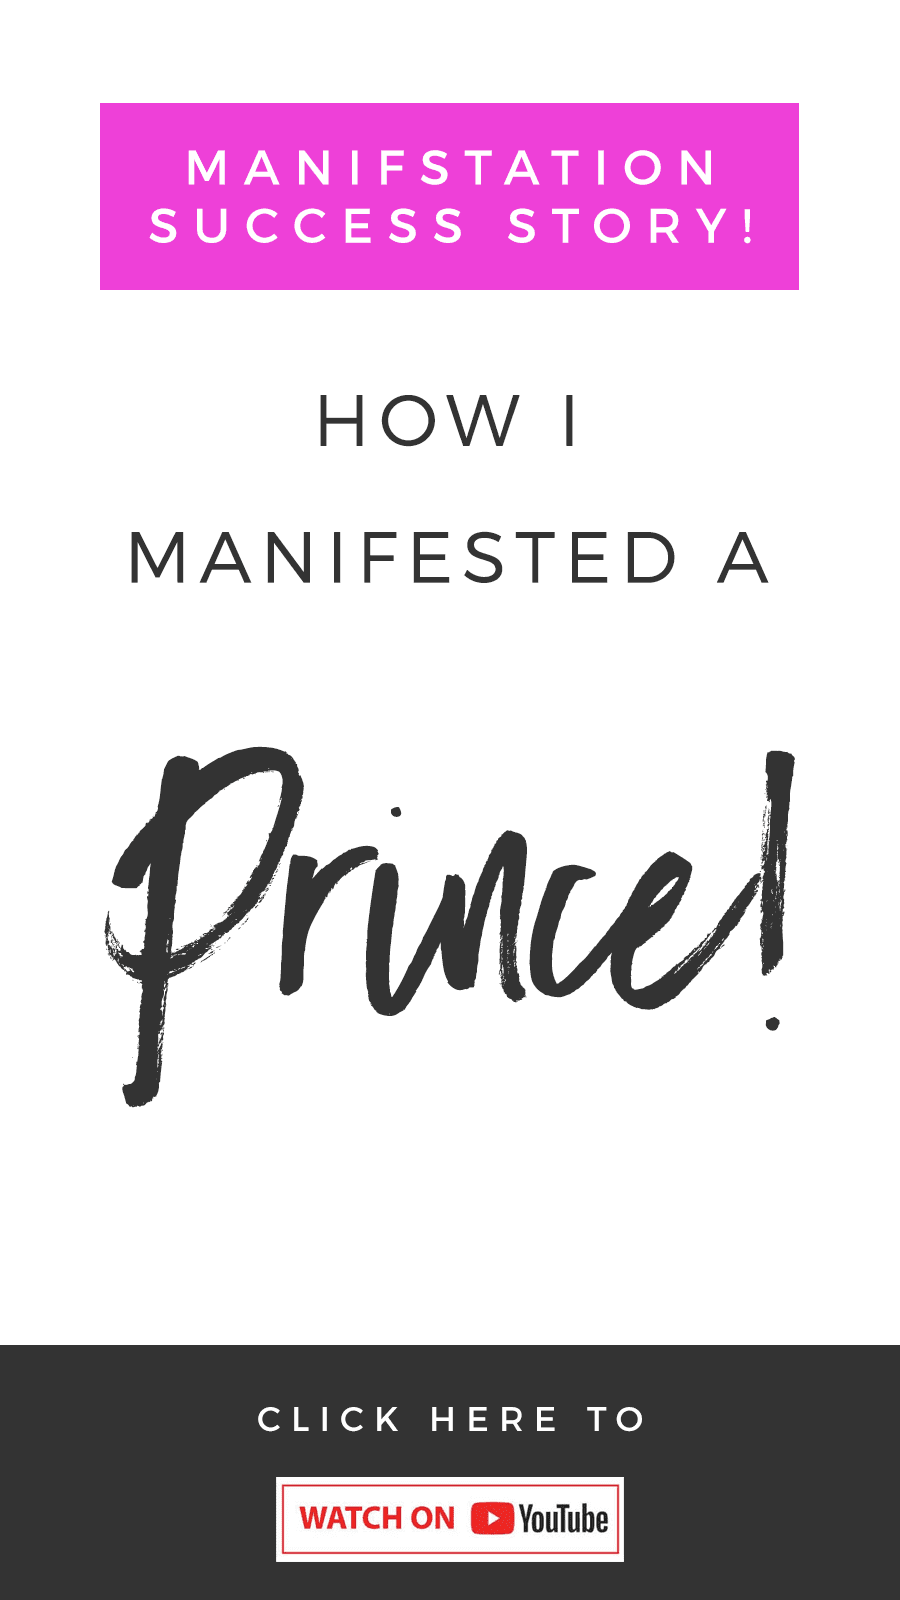 Manifestation Success Story: How I Manifested A Prince